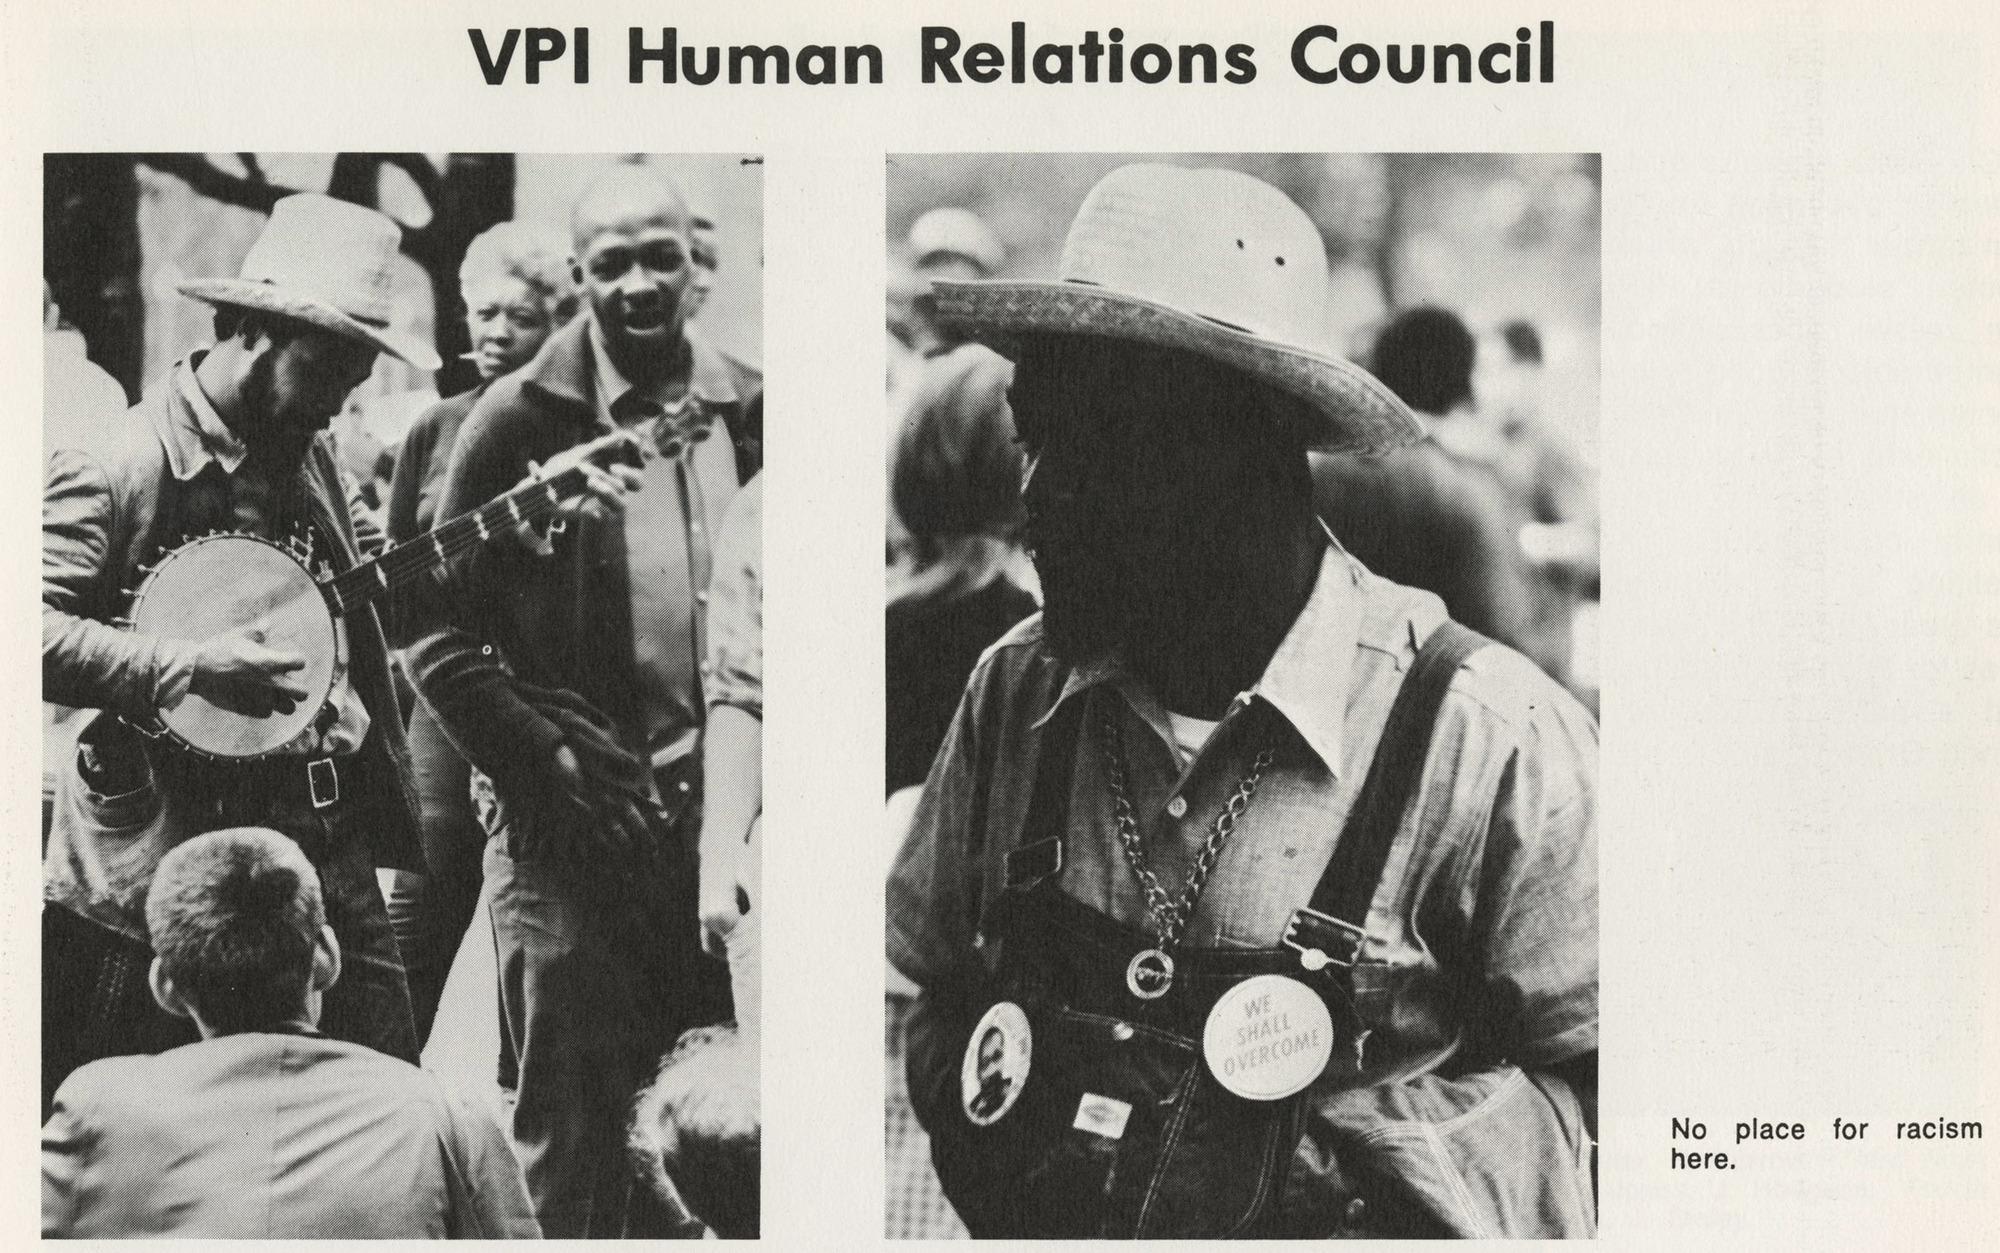 http://spec.lib.vt.edu/pickup/Omeka_upload/Bugle1969_pg201_HumanRelations.jpg